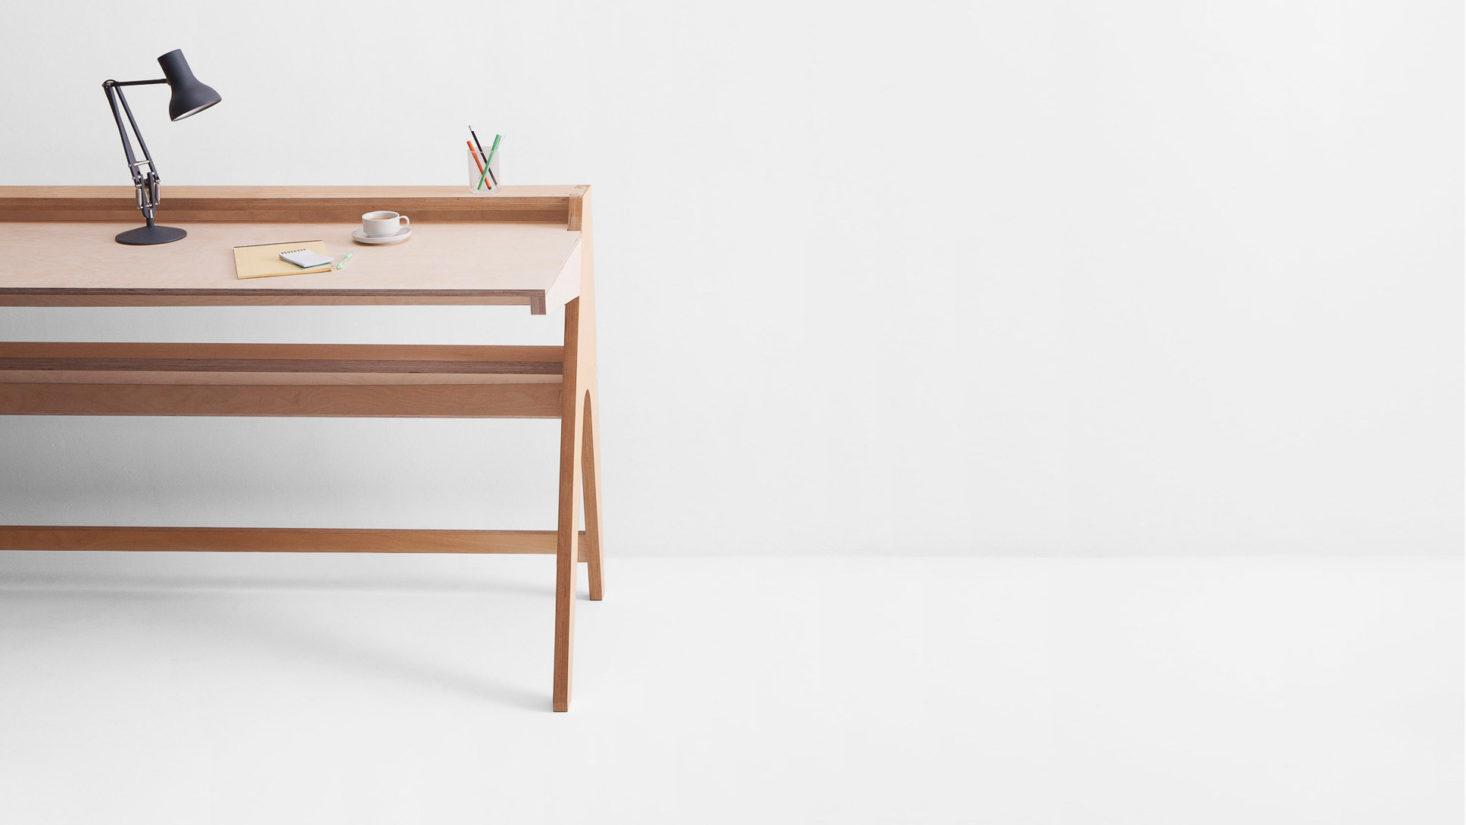 opendesk-lift-standing-desk-in-situ-1466x825.jpg